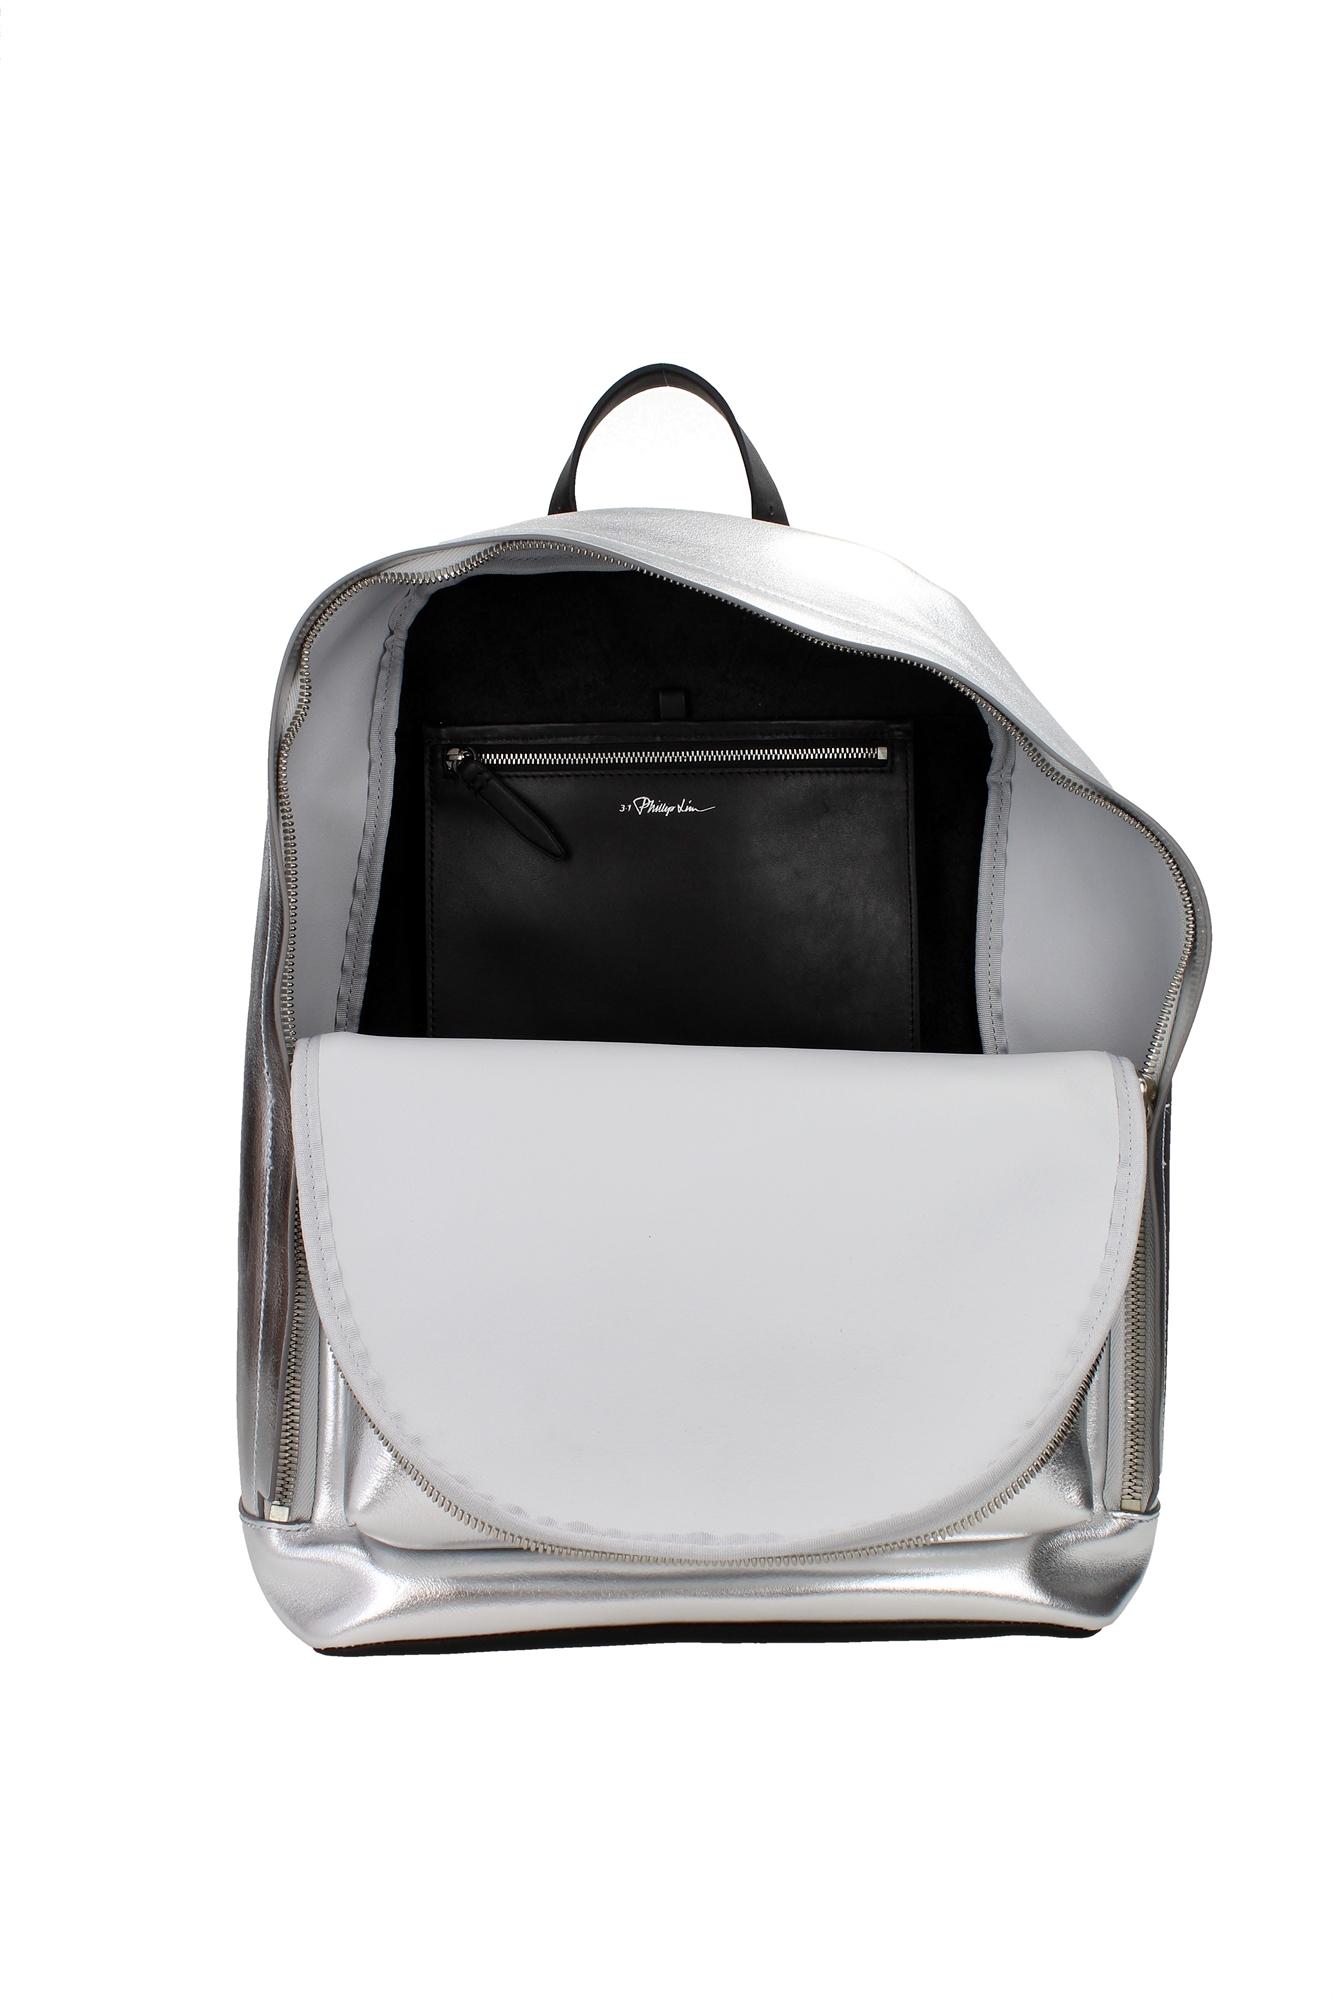 tasche rucksack 3 1 phillip lim herren leder silber ah15b015mnpmetallictin ebay. Black Bedroom Furniture Sets. Home Design Ideas